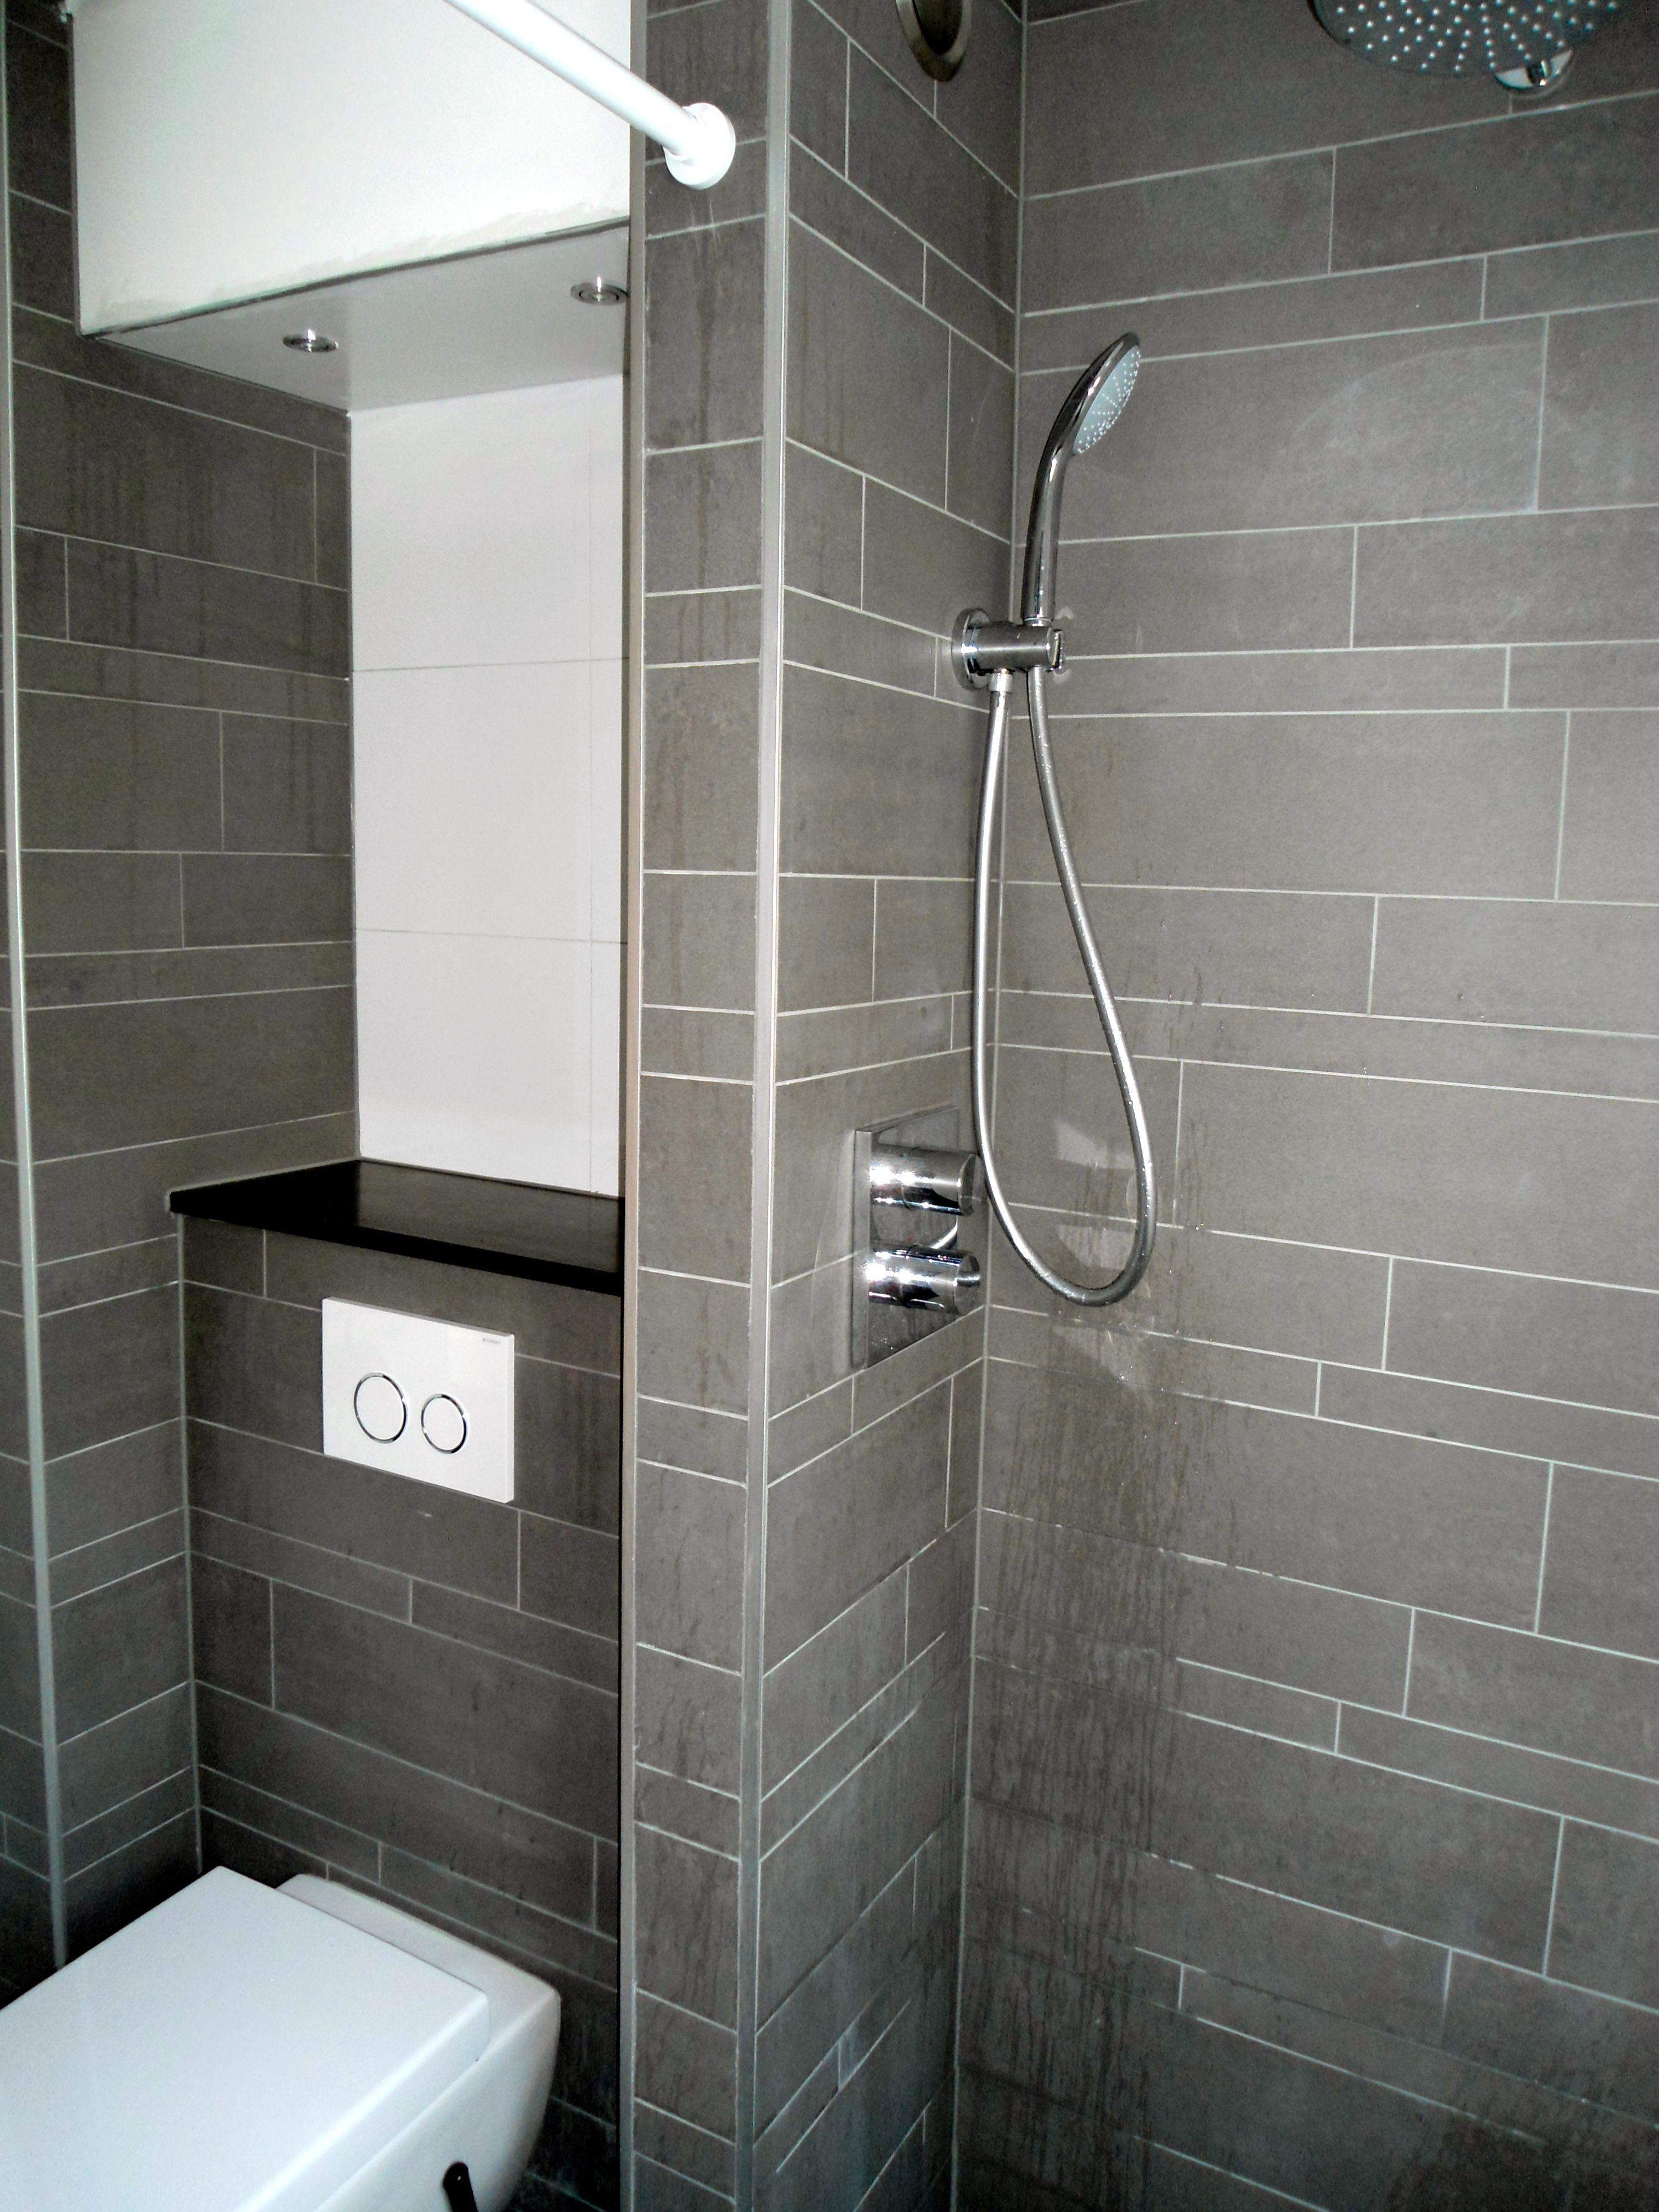 Muurtje achter wc natuursteenplankje op muurtje badkamer inspiratie pinterest - Badkamer wc ...